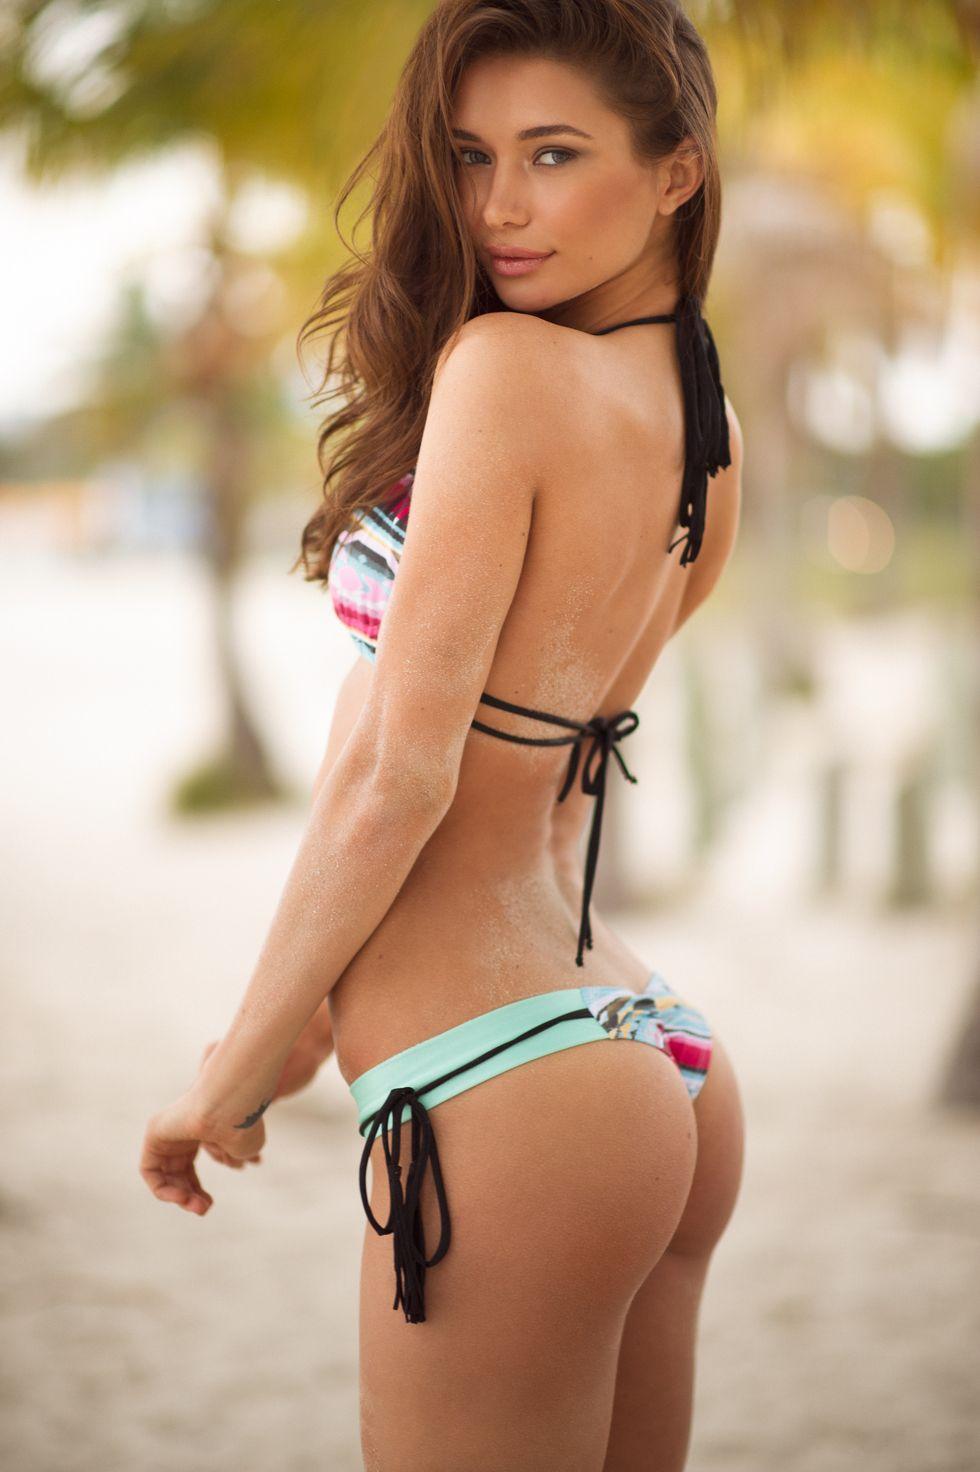 Pictures of my girlfriends bikini phrase... super